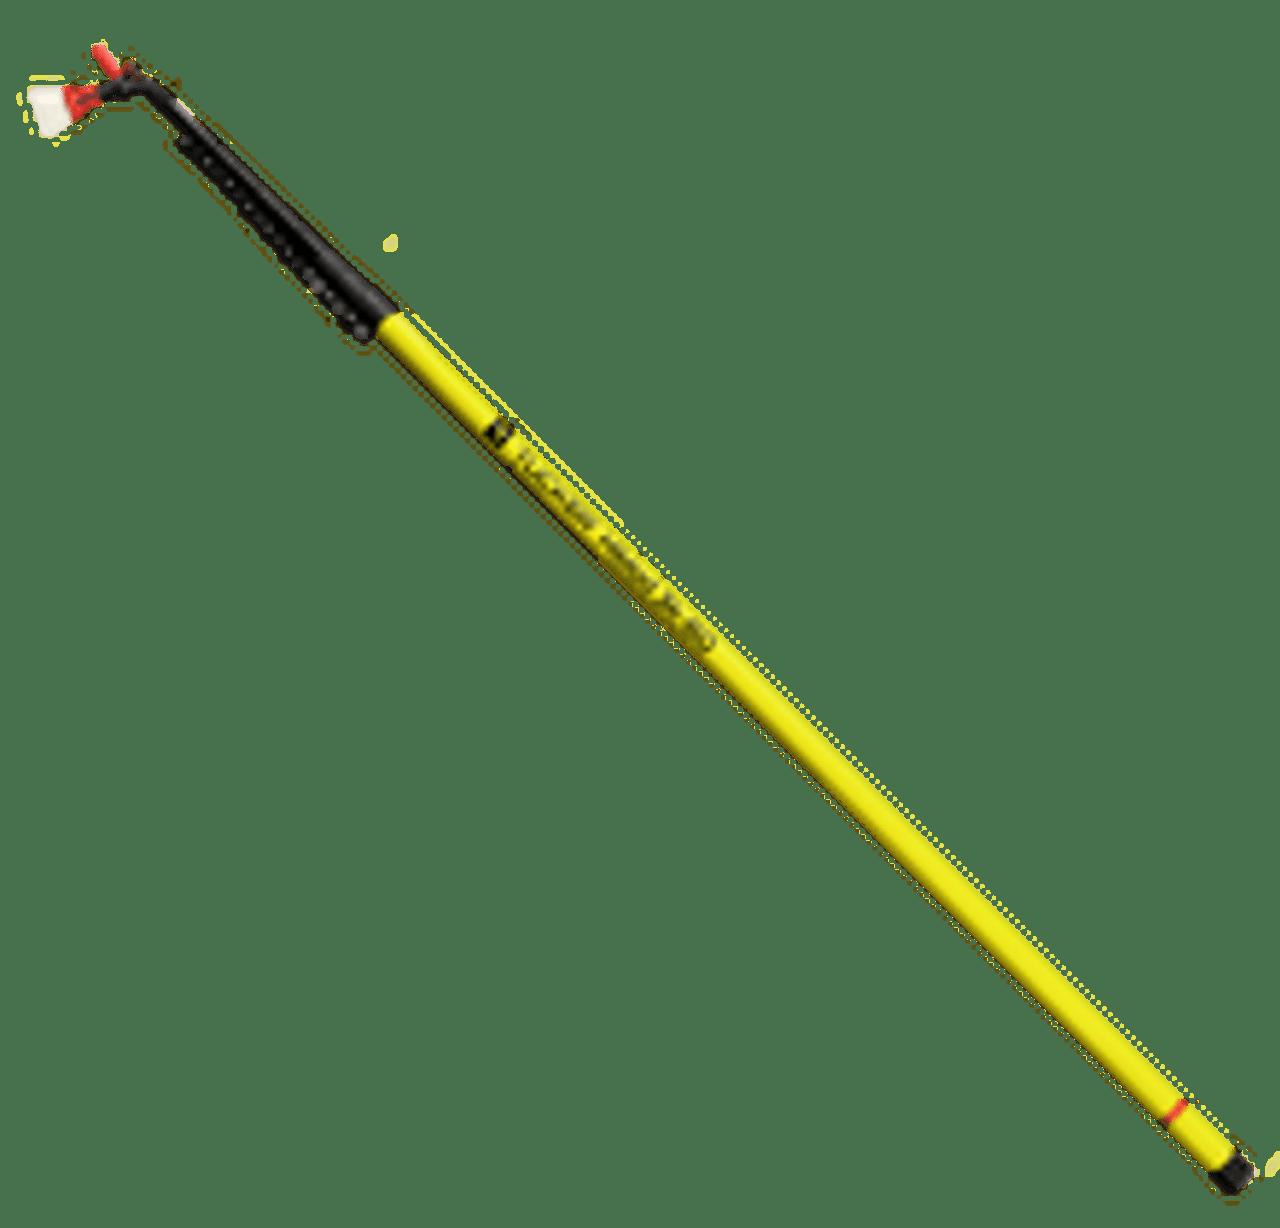 custom built model 60 3k high modulus carbon fiber water fed pole